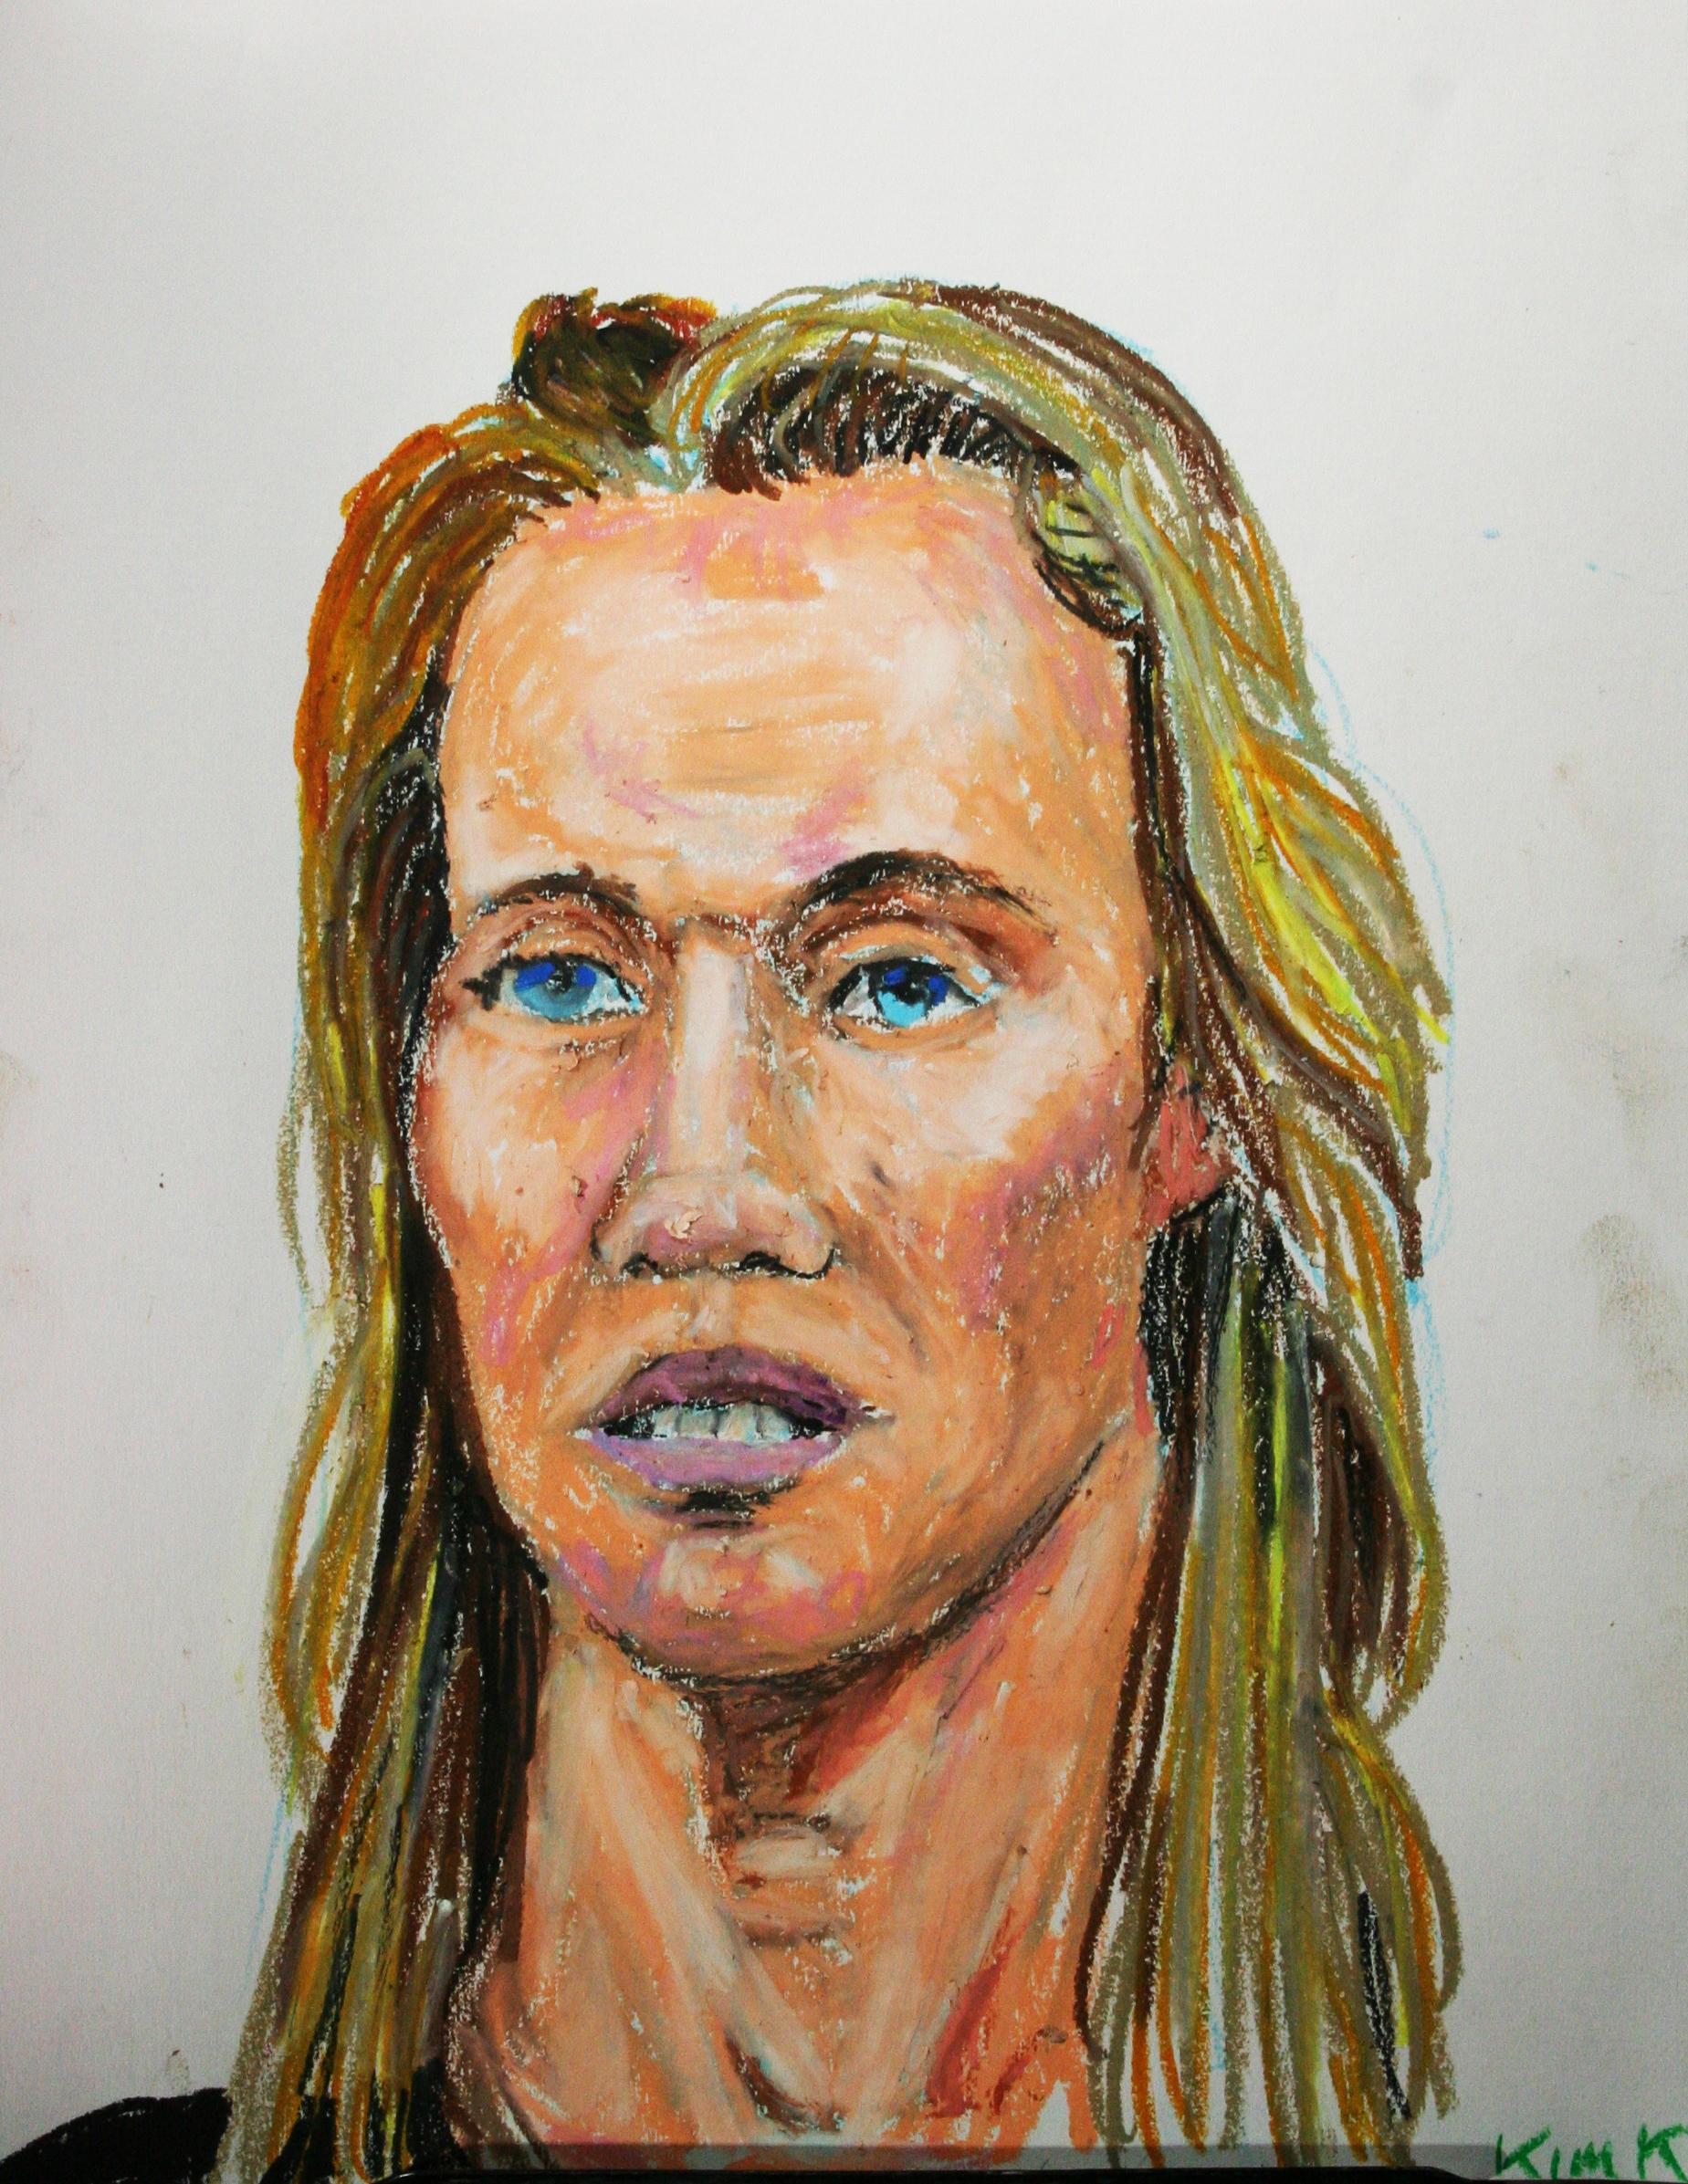 Kris Kristensen did this two hour pastel drawing.